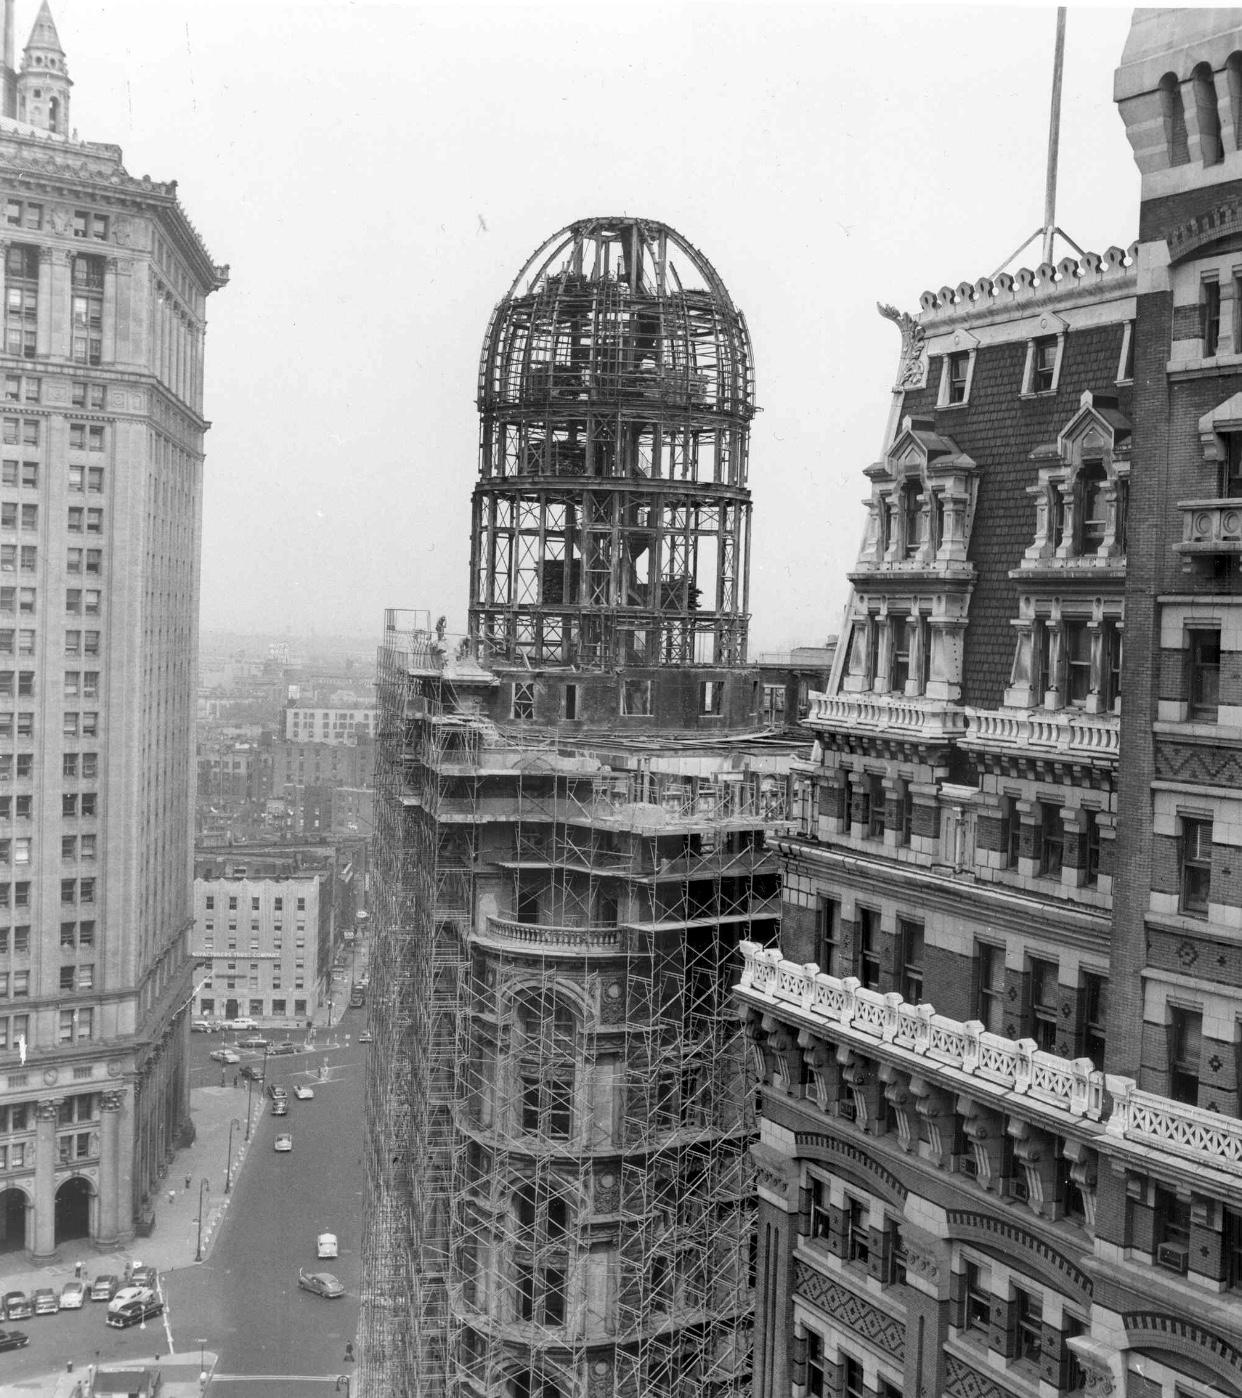 World Building demolition, 1955. Tribune Building on the right before demolition.